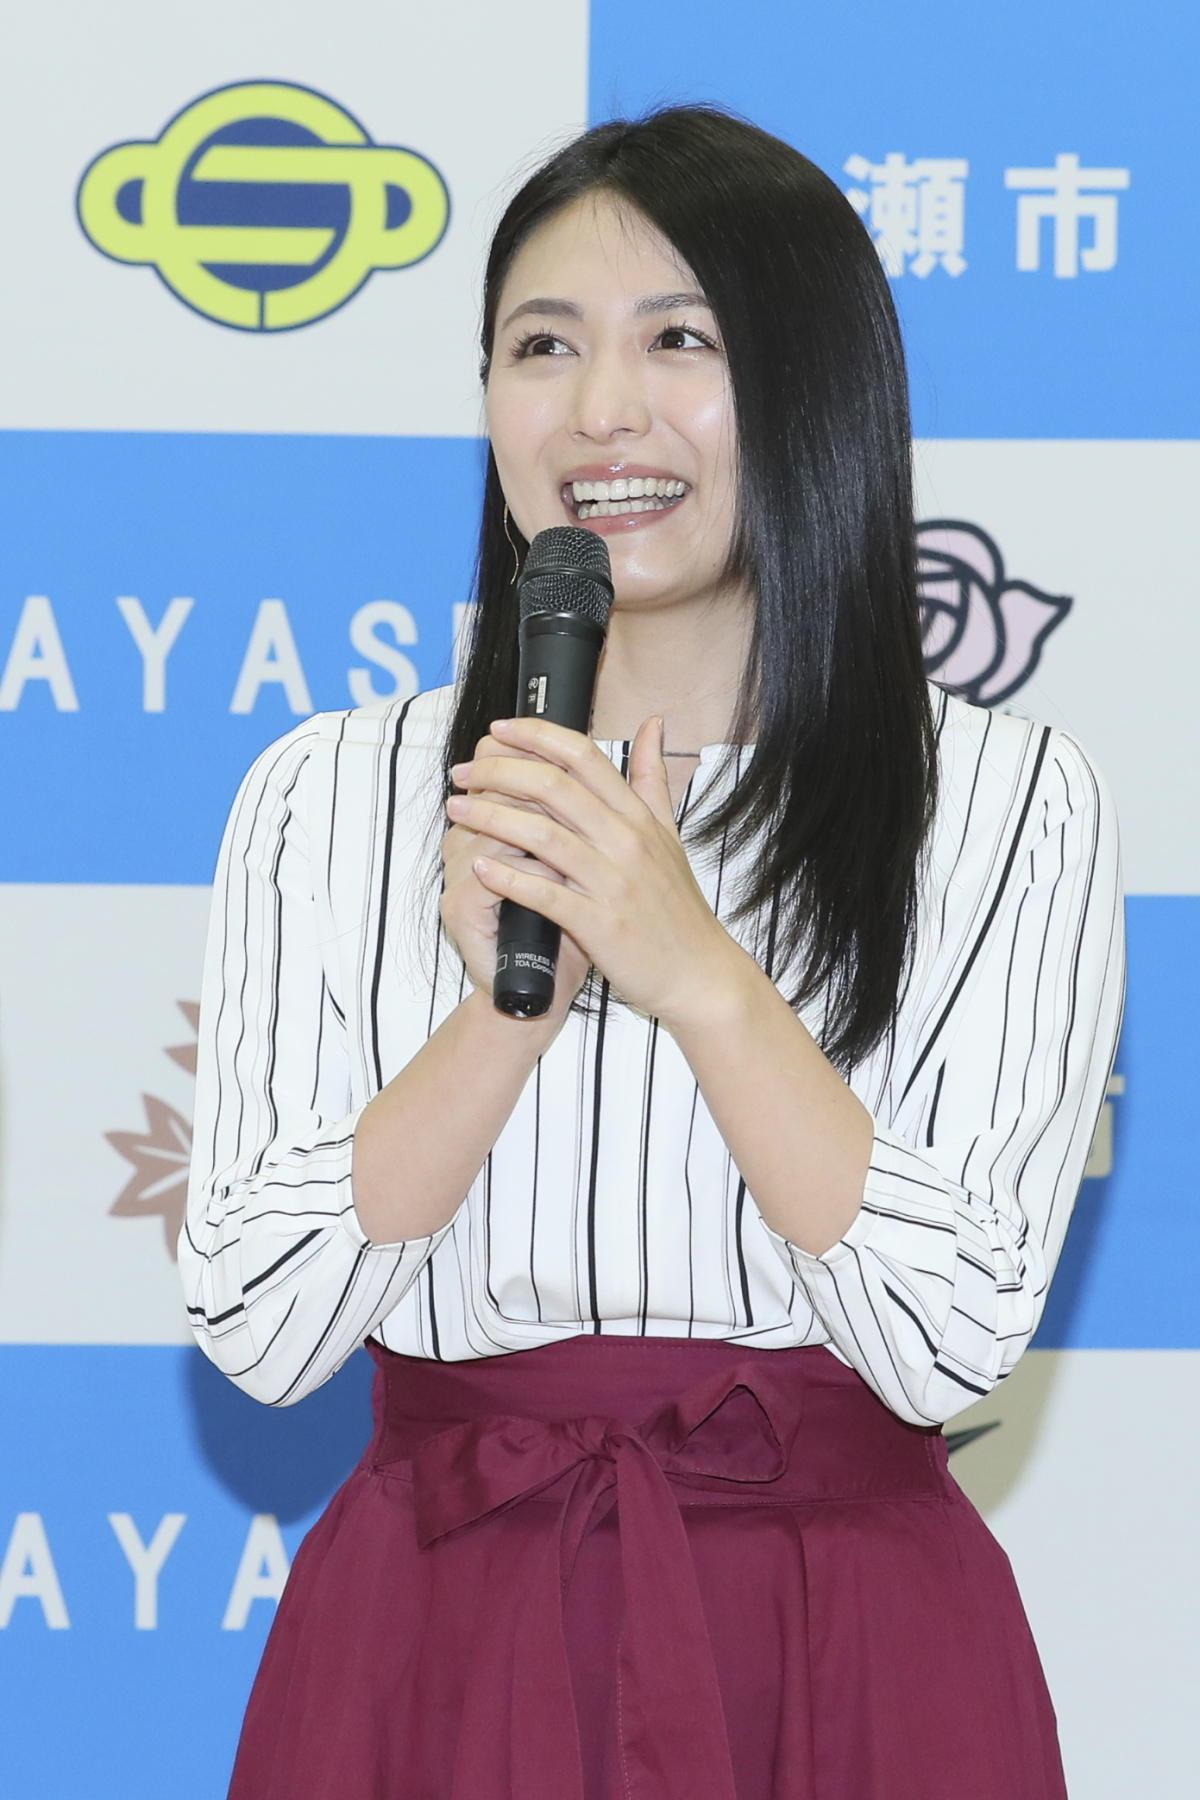 http://news.yoshimoto.co.jp/20190115224005-8e8b43b3c364c29c2c95b3a19157026db37eb9e4.jpg